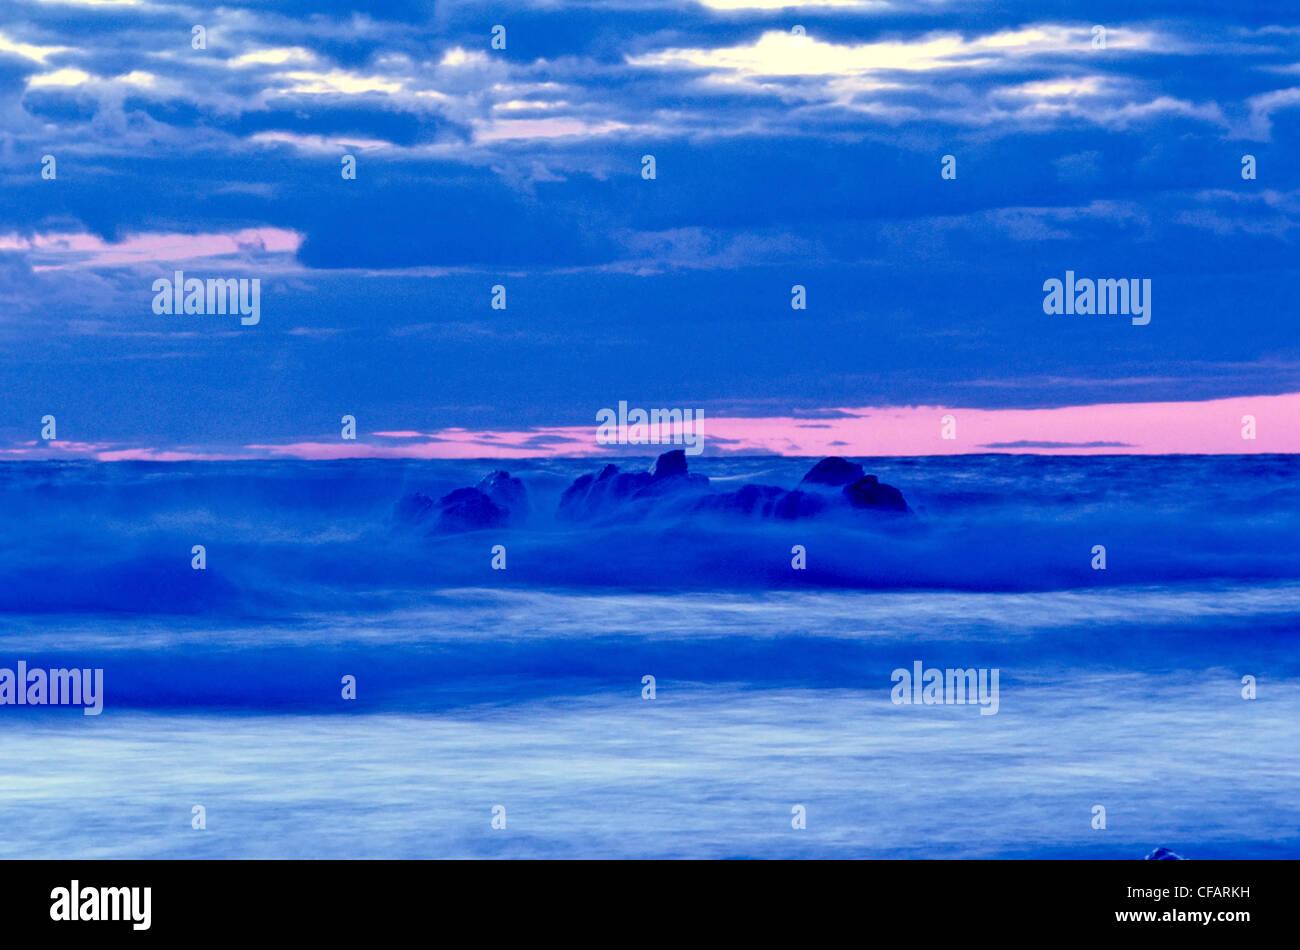 Waves breaking over rocks, Presqu'ille, Cape Breton Highlands National Park, Nova Scotia, Canada. - Stock Image